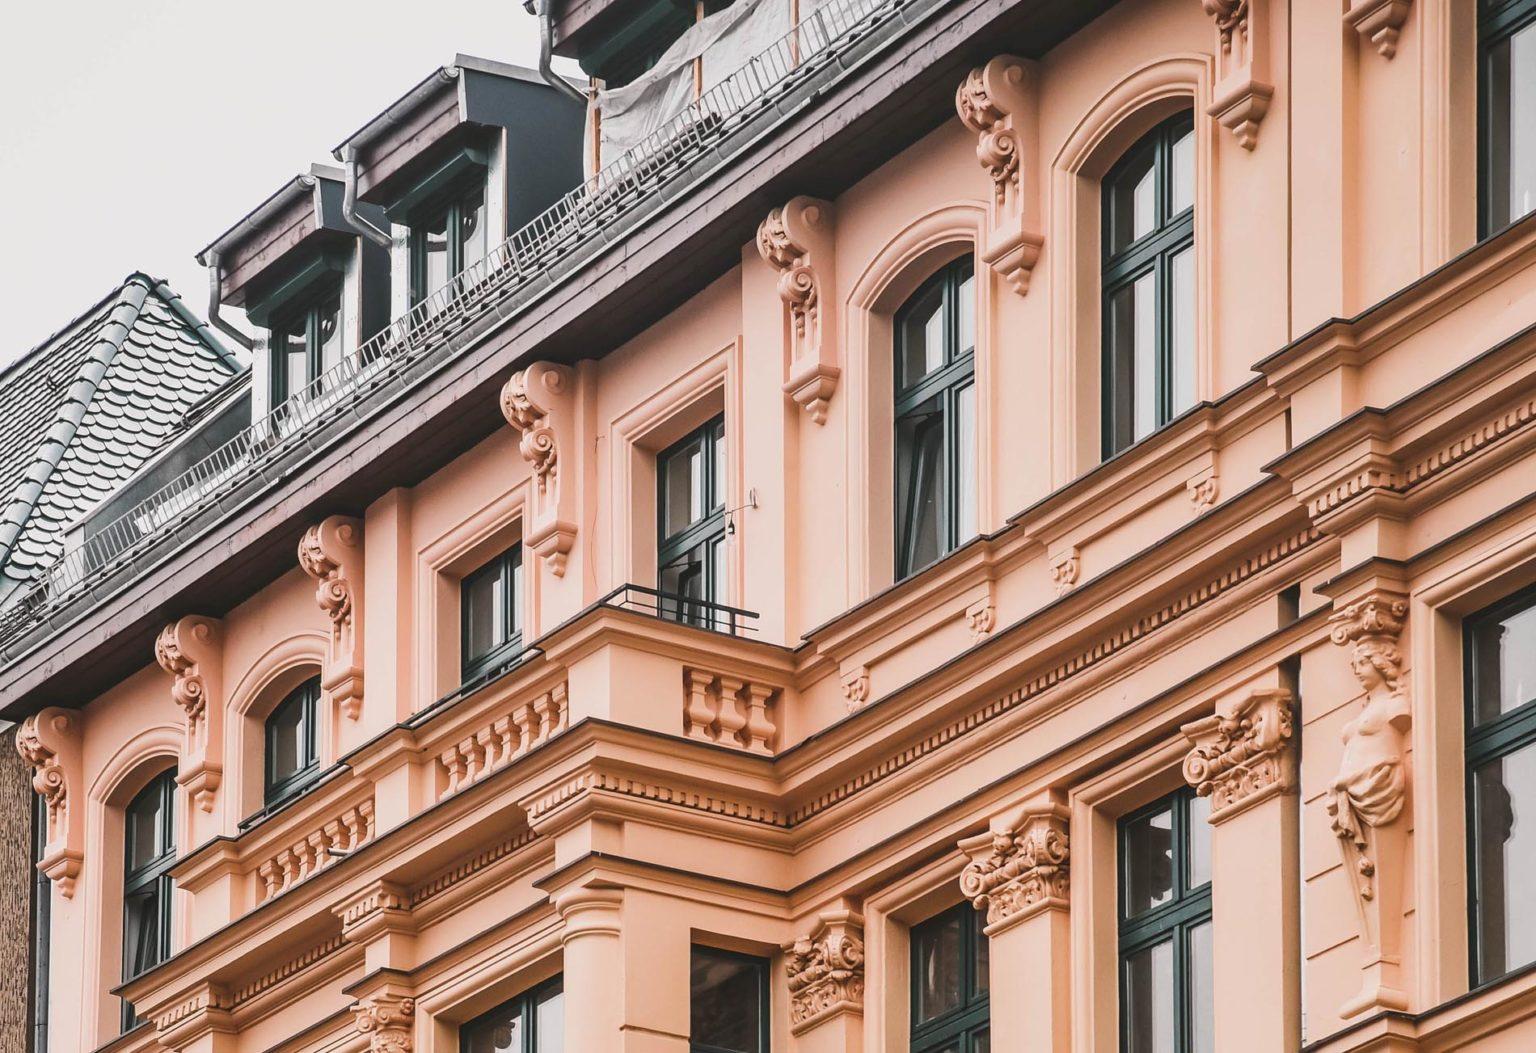 Parifizierung-Teilung-Wien-Altbau-Zinshaus-parifizieren